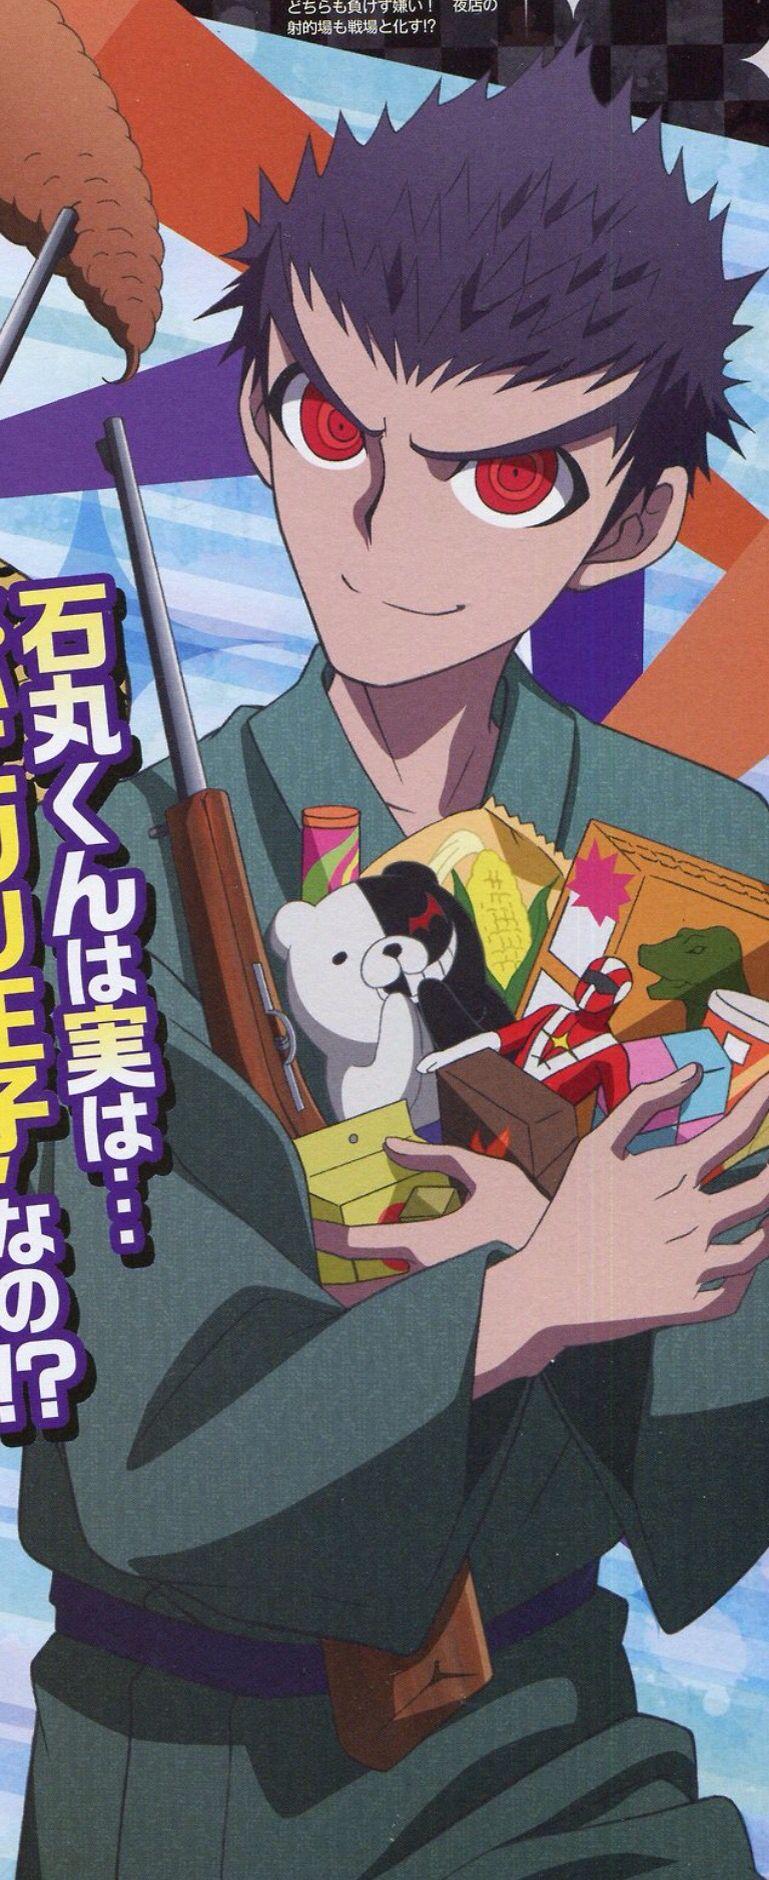 Ishimaru Danganronpa, Anime, Trigger happy havoc